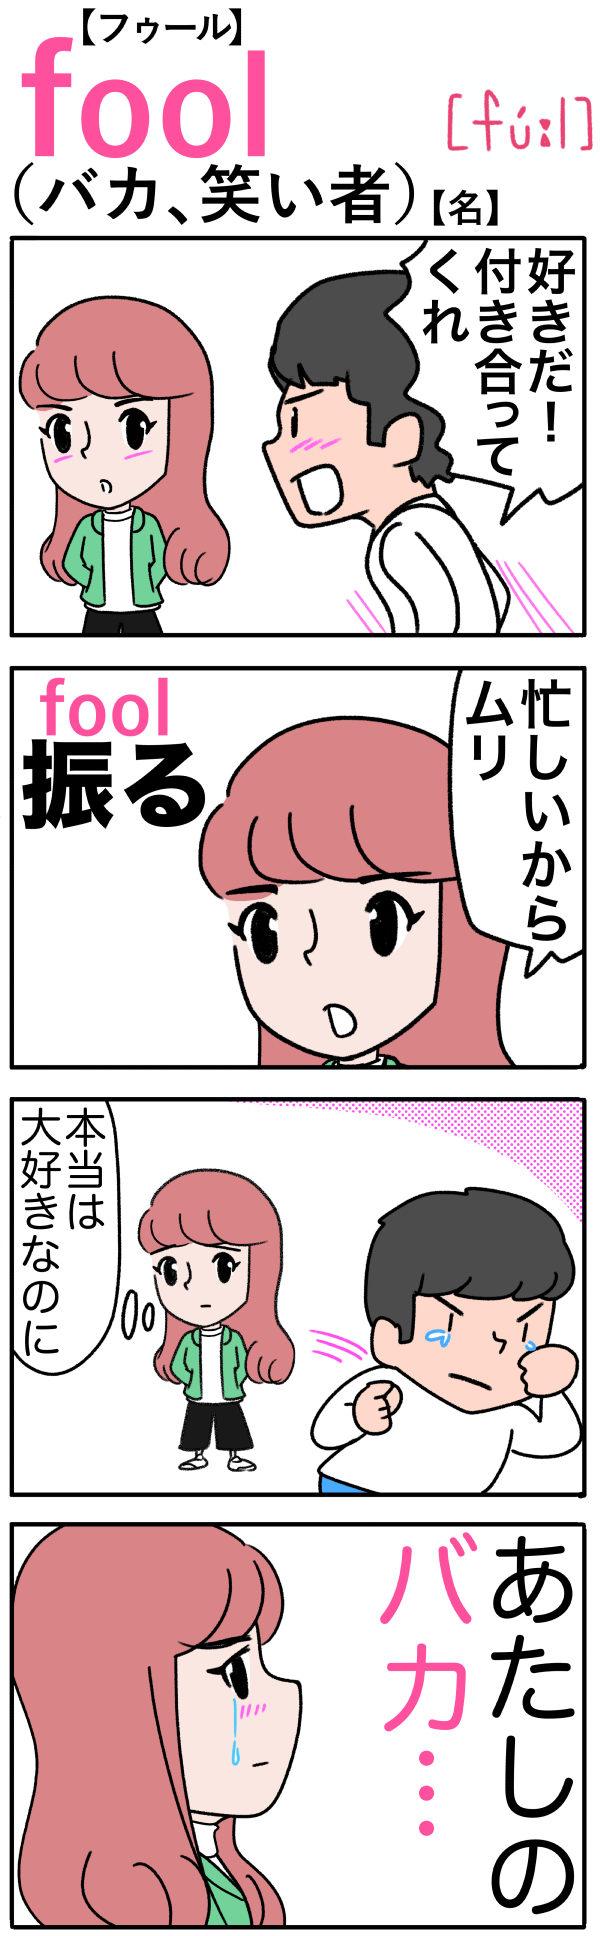 fool(バカ、笑い者)の語呂合わせ英単語